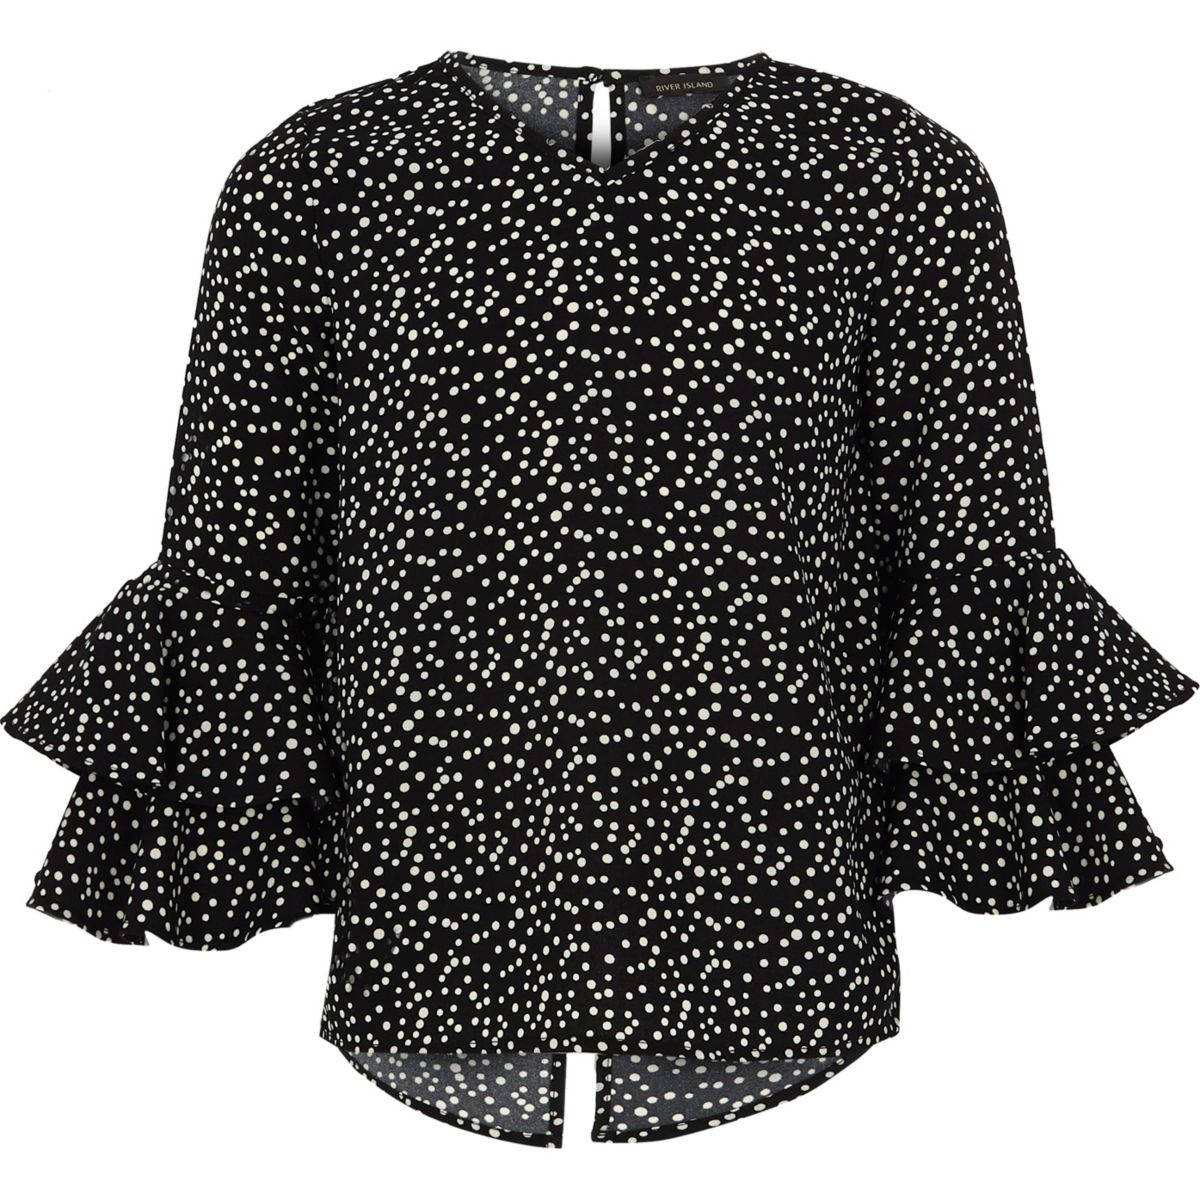 Girls black polka dot frill bell sleeve top